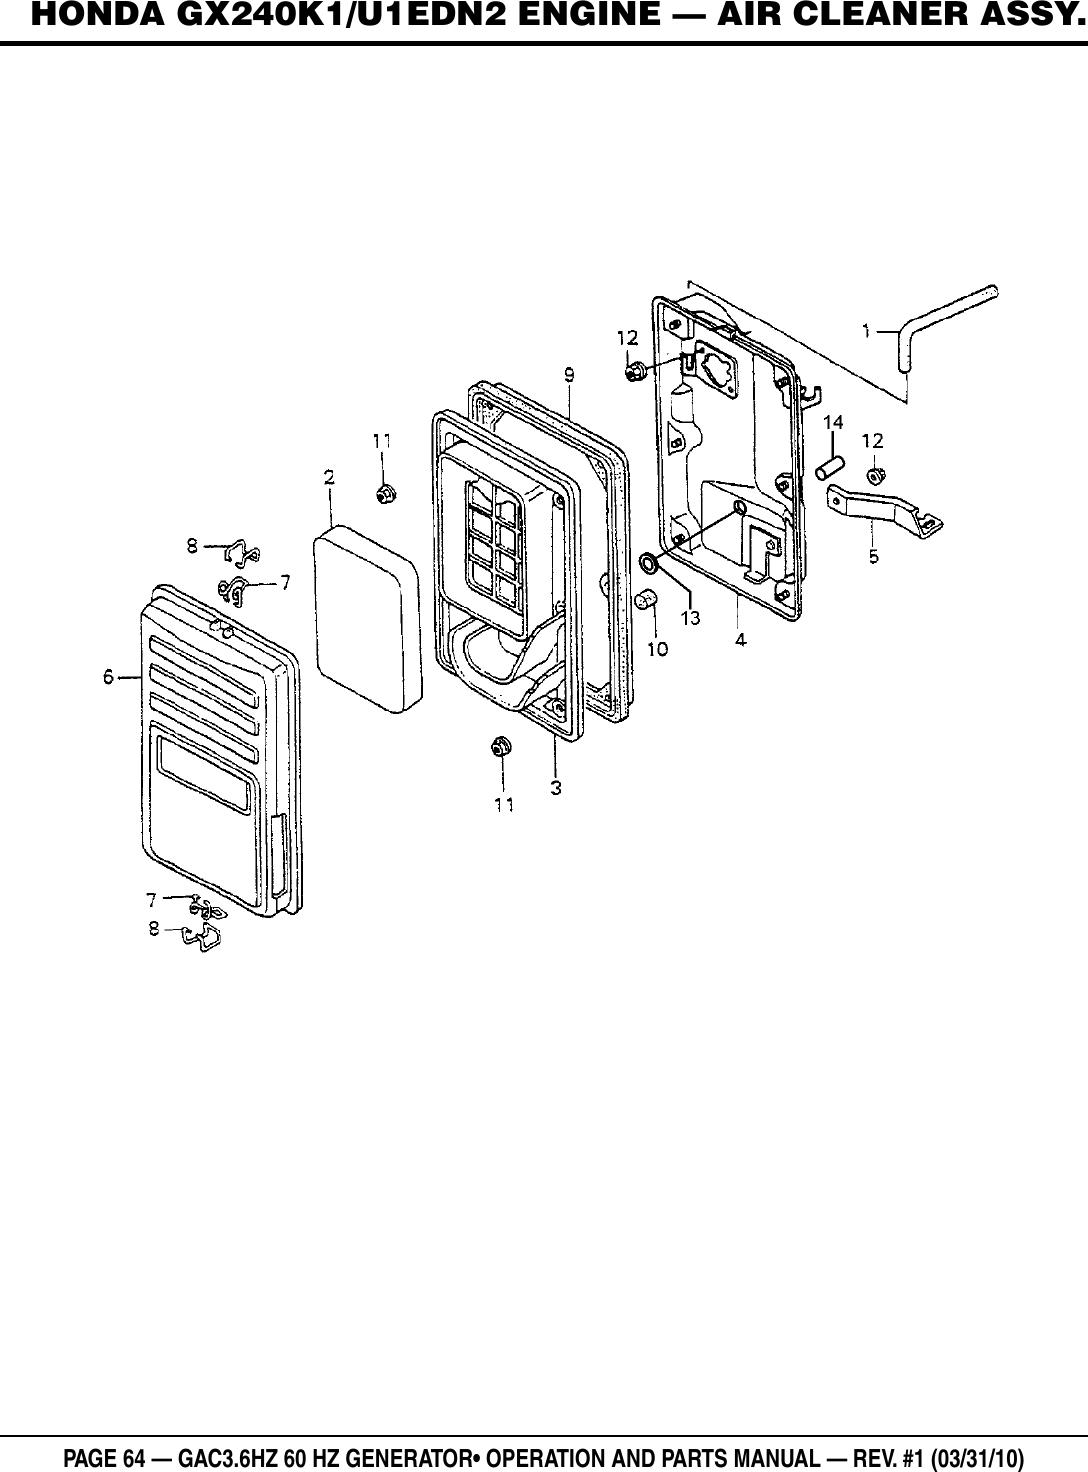 Multiquip Gac3 6Hz Users Manual on